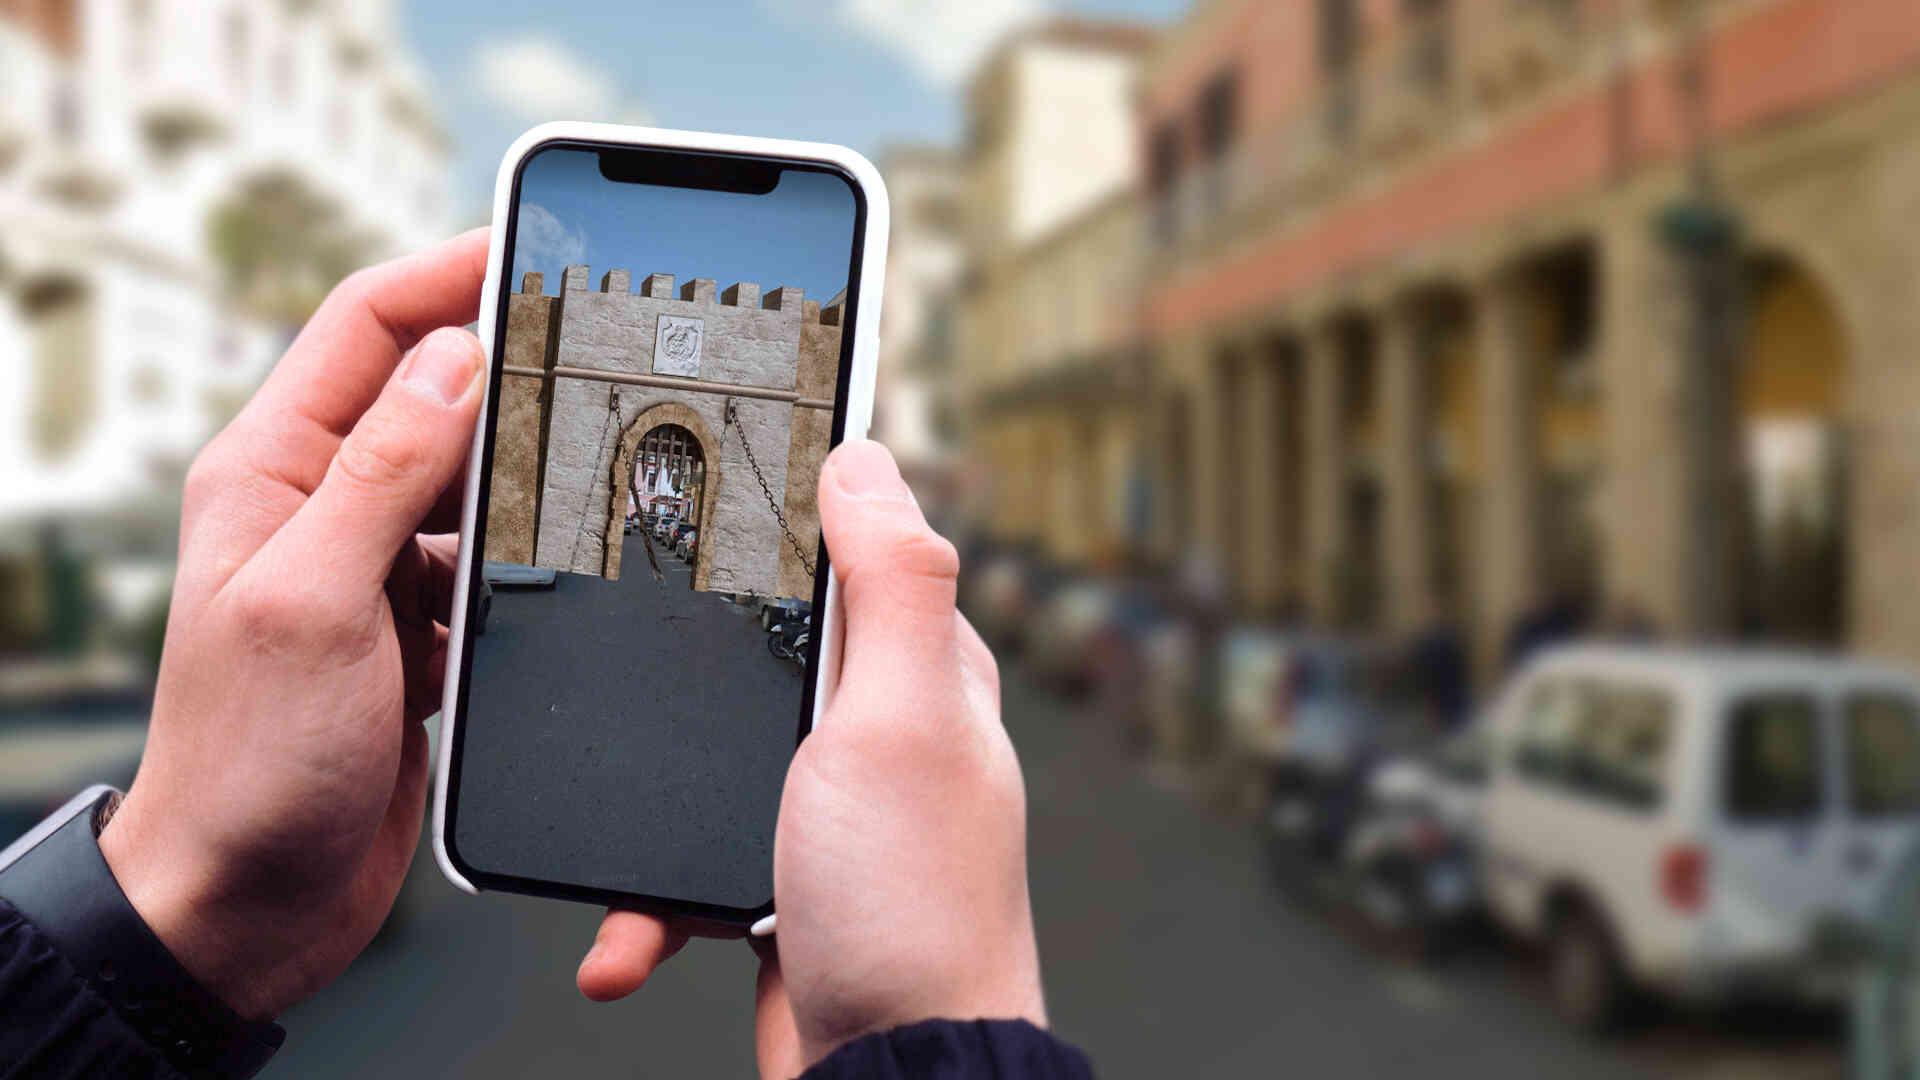 Itinerari association, augmented reality app